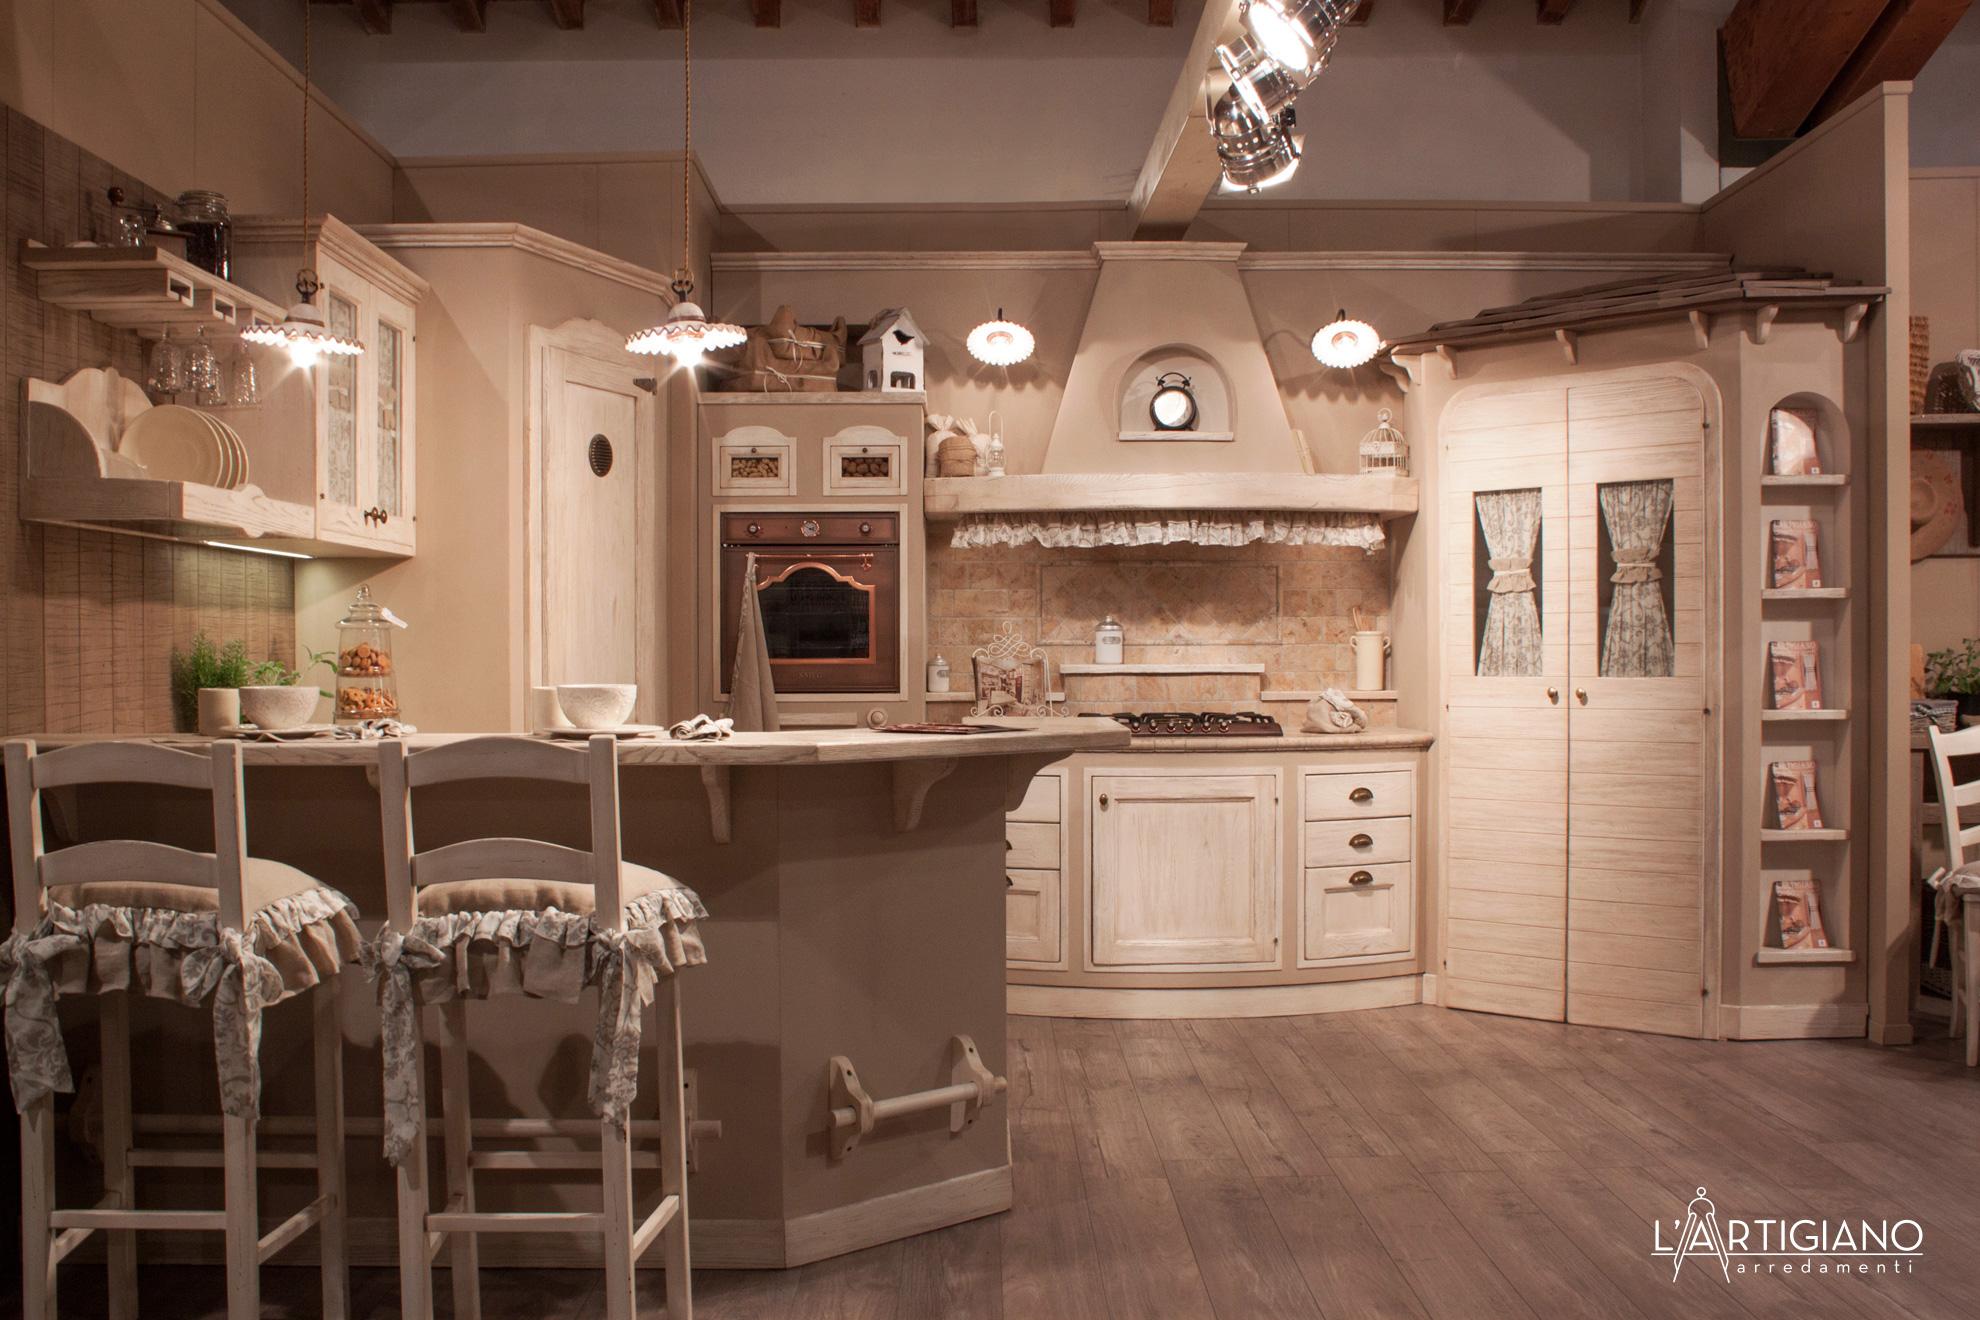 Penisola Cucina In Muratura cucina country: cucina in muratura rhonda avorio - l